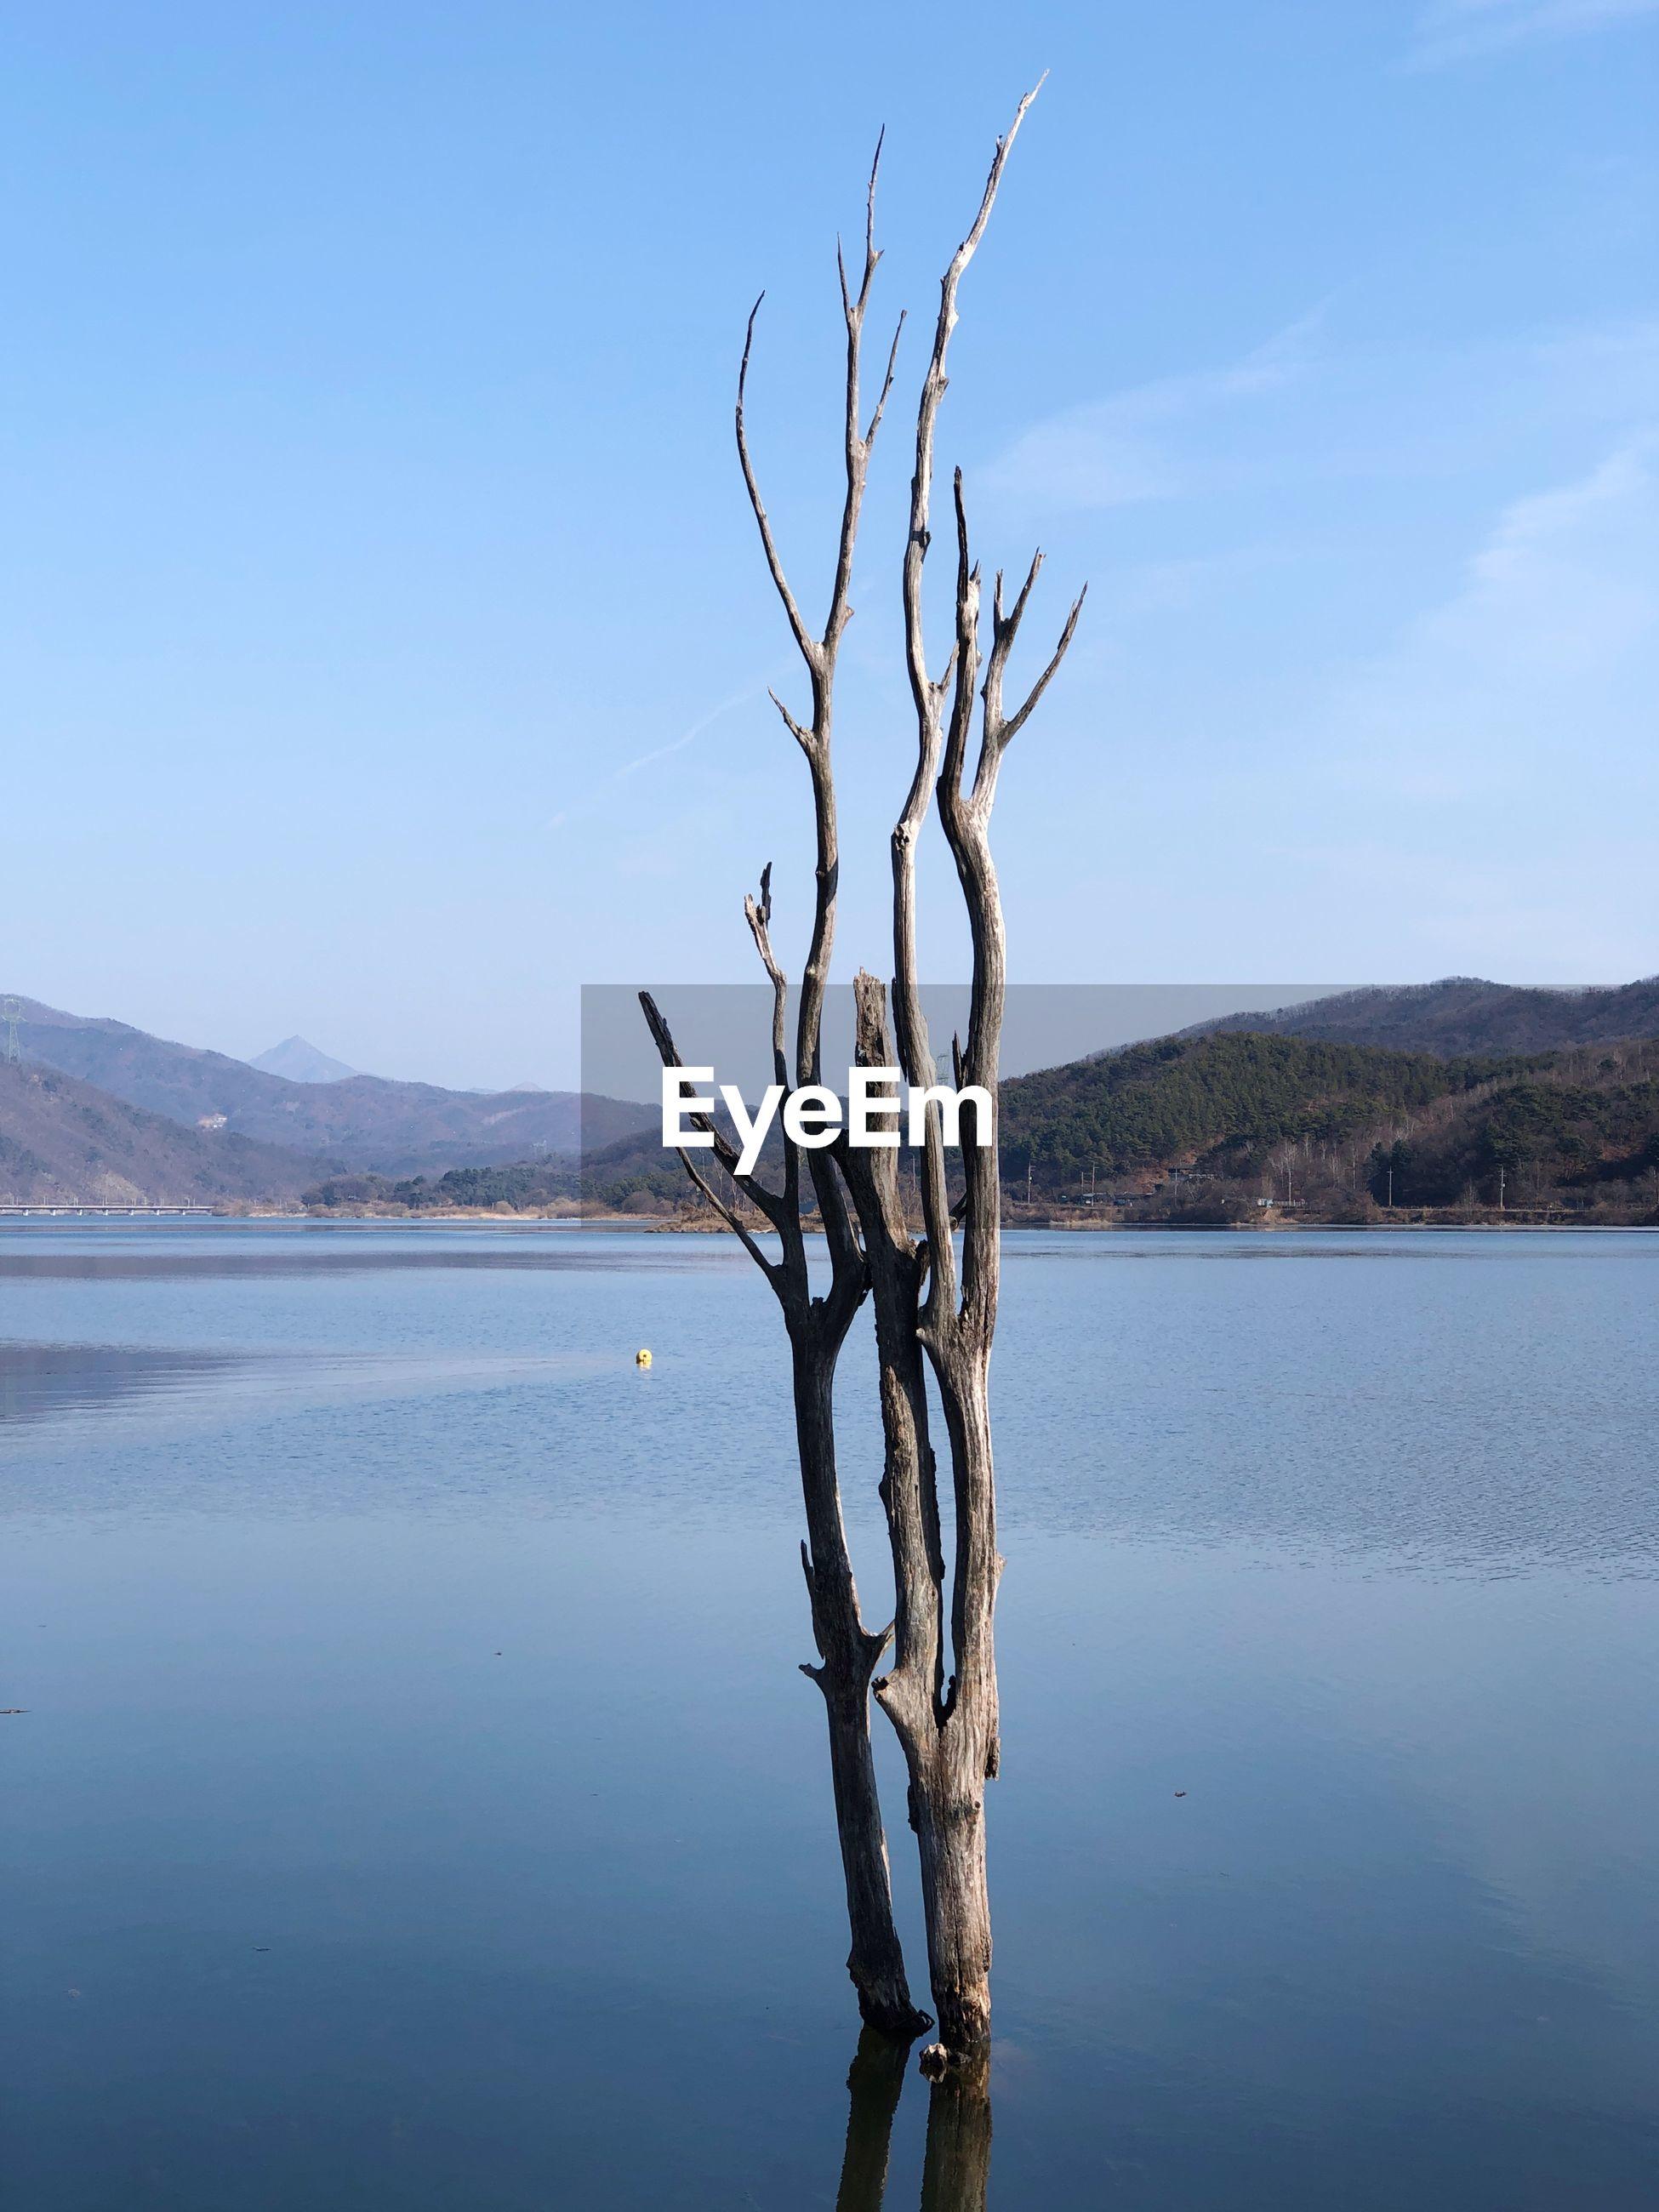 BARE TREE ON LAKE AGAINST SKY